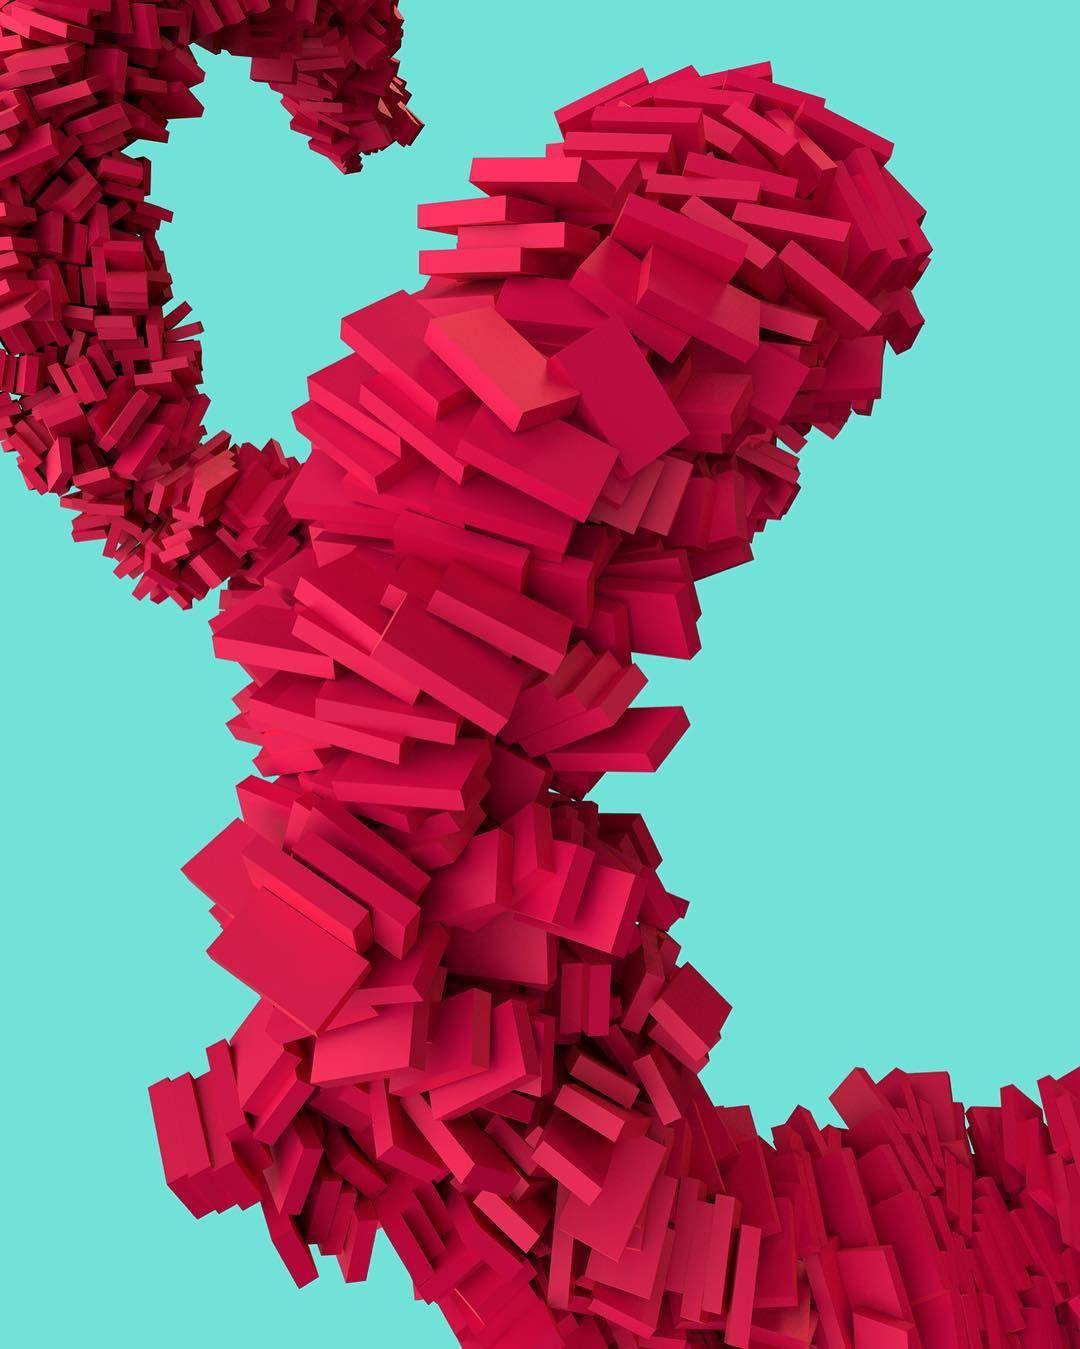 'Swirly Thing' Artwork 2016  #digitalart #illustration #abstractart #c4d #cinema4d #designlife #designporn #designstudio #graphicartist by dnyivn